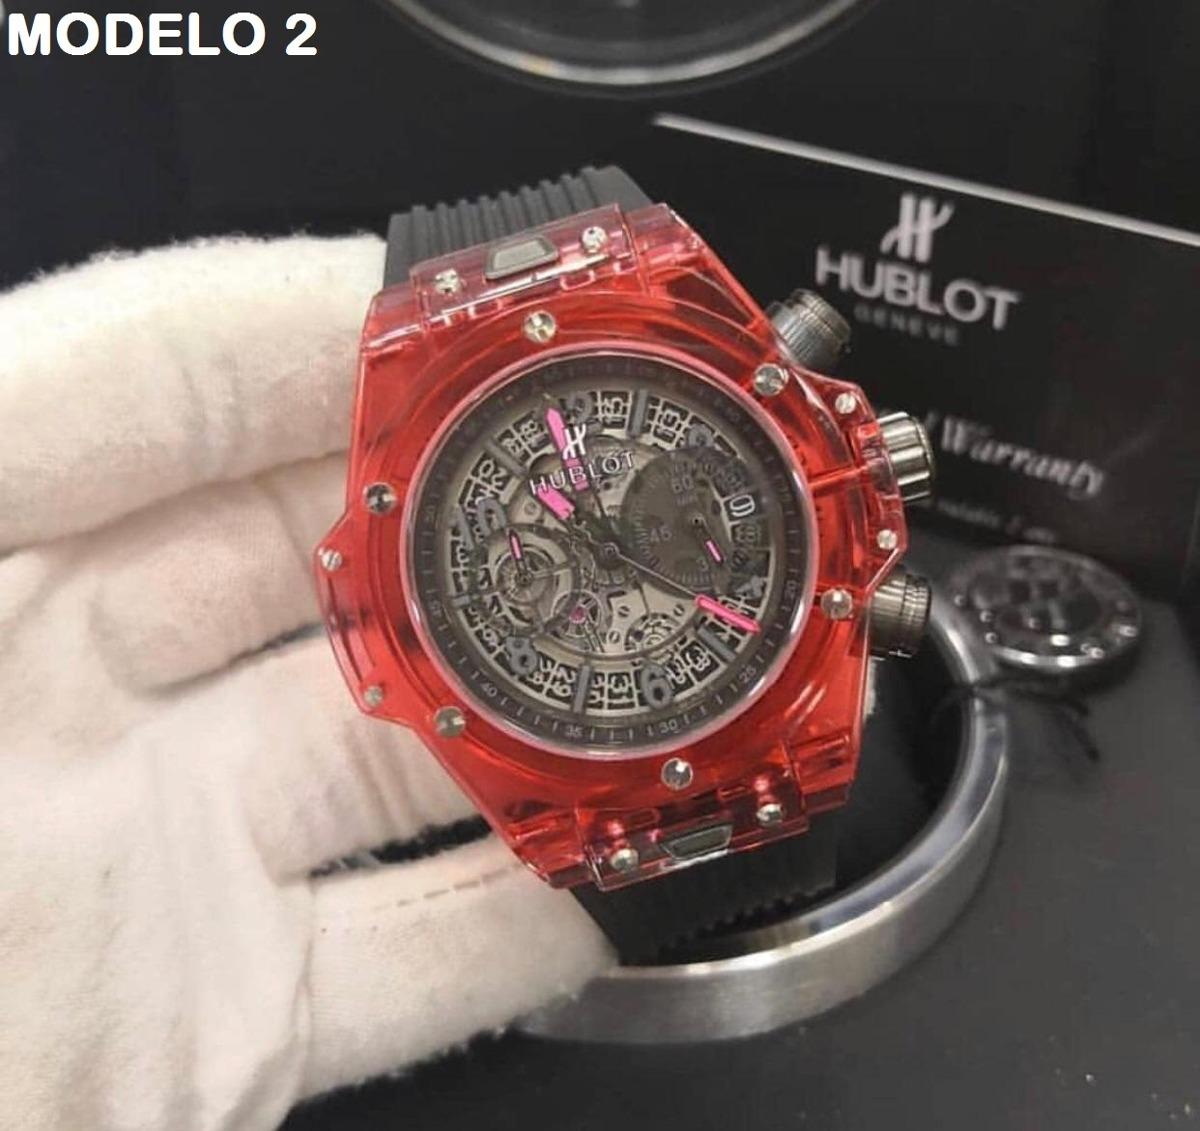 e140e2df6f7 Relógio Hublot · Relógio Hublot · Relógio Hublot ...